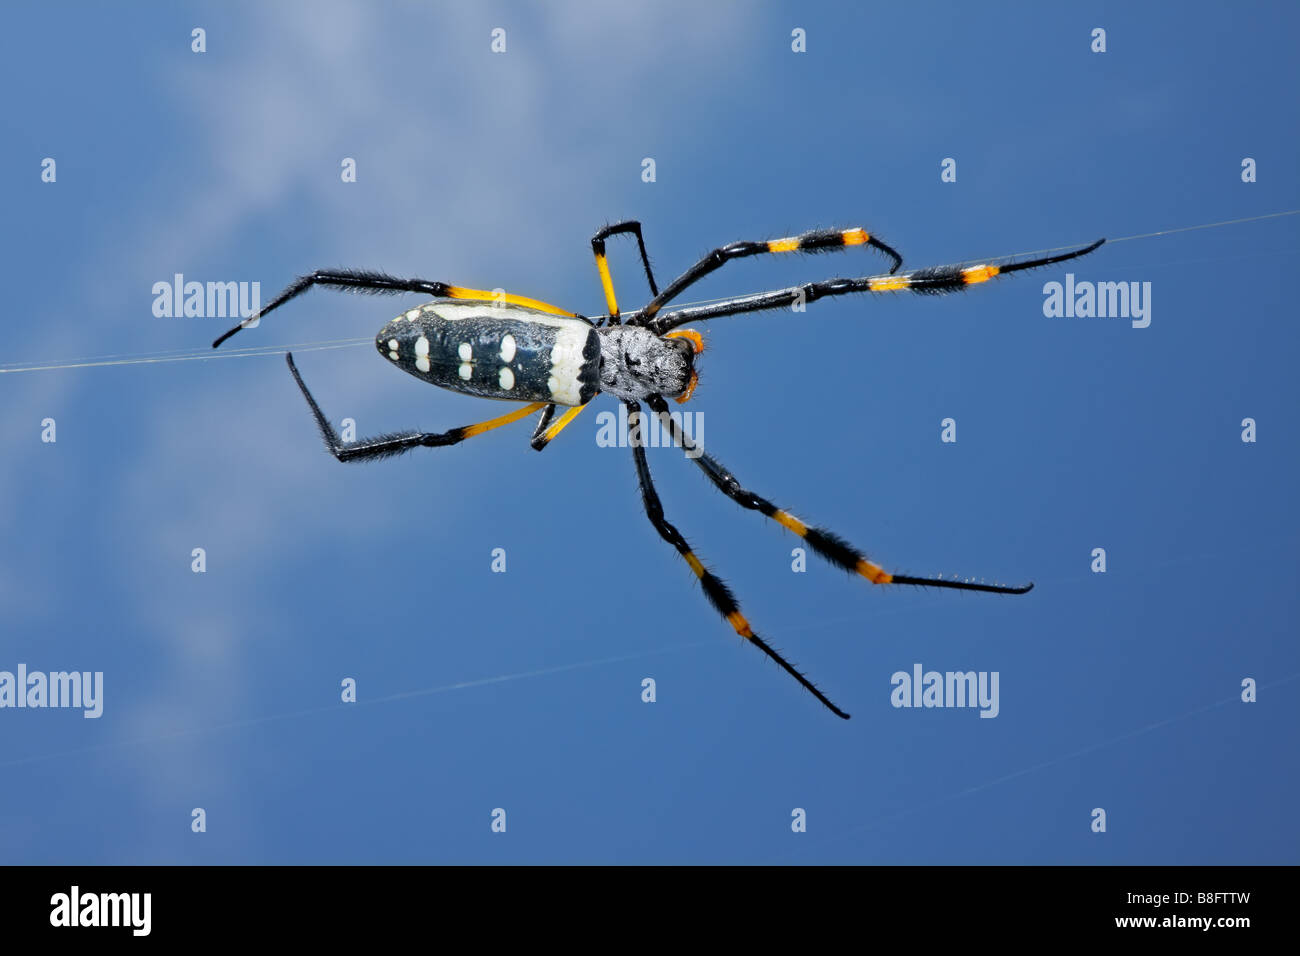 Golden orb web spider (Nephila senegalensis) against a blue sky, South Africa - Stock Image